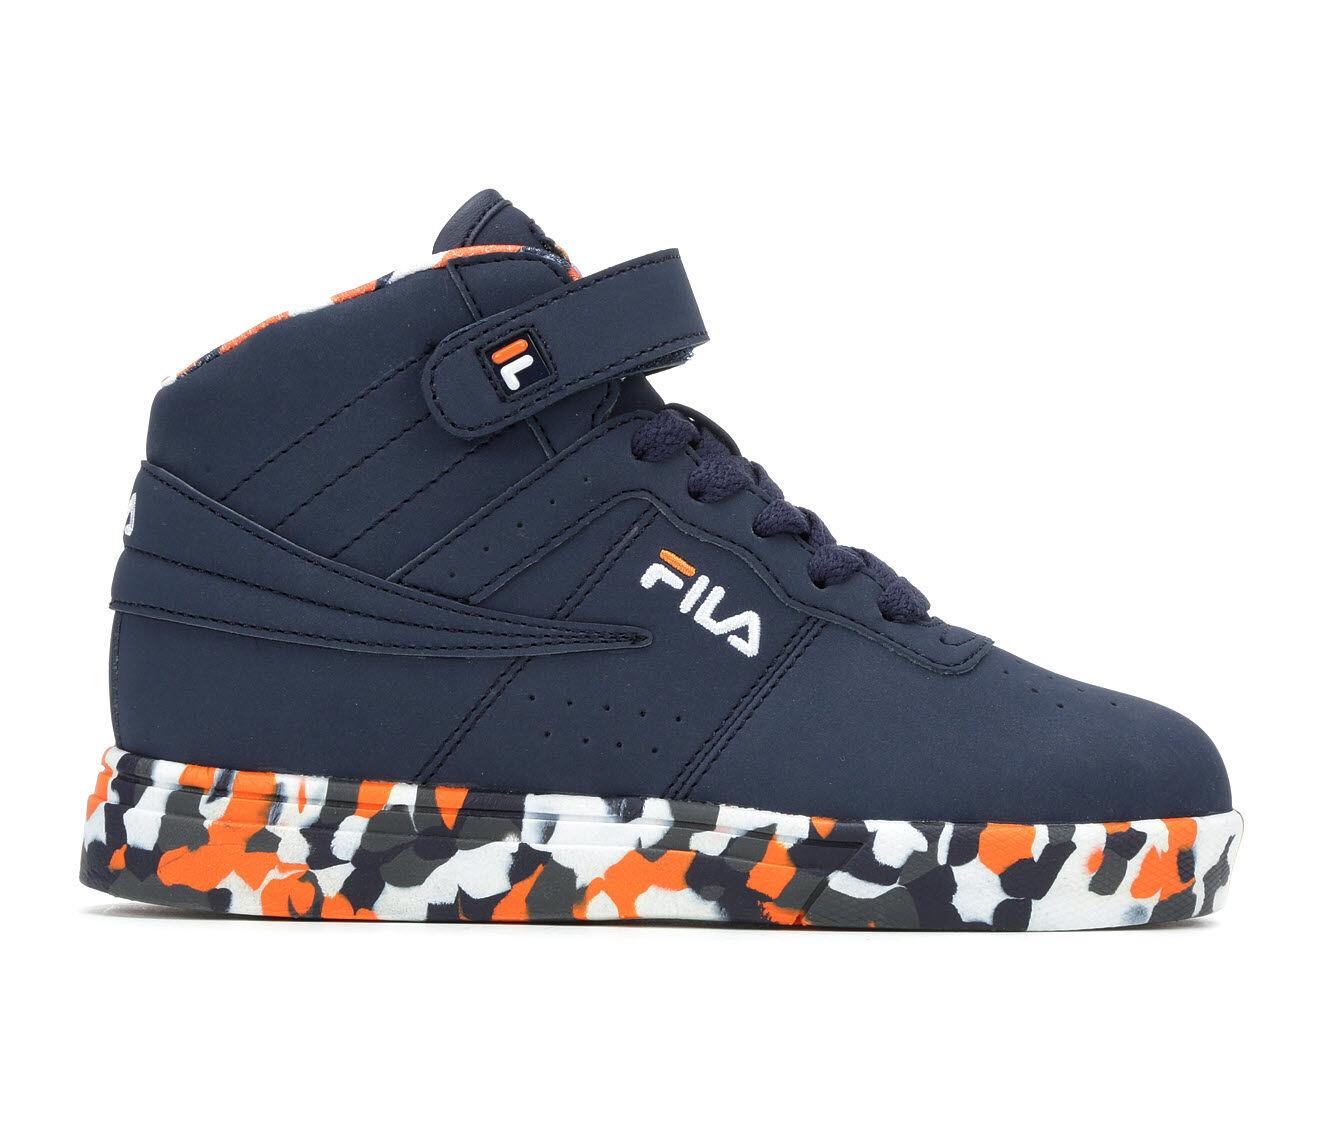 Kids' Fila Tennis Shoes | Shoe Carnival